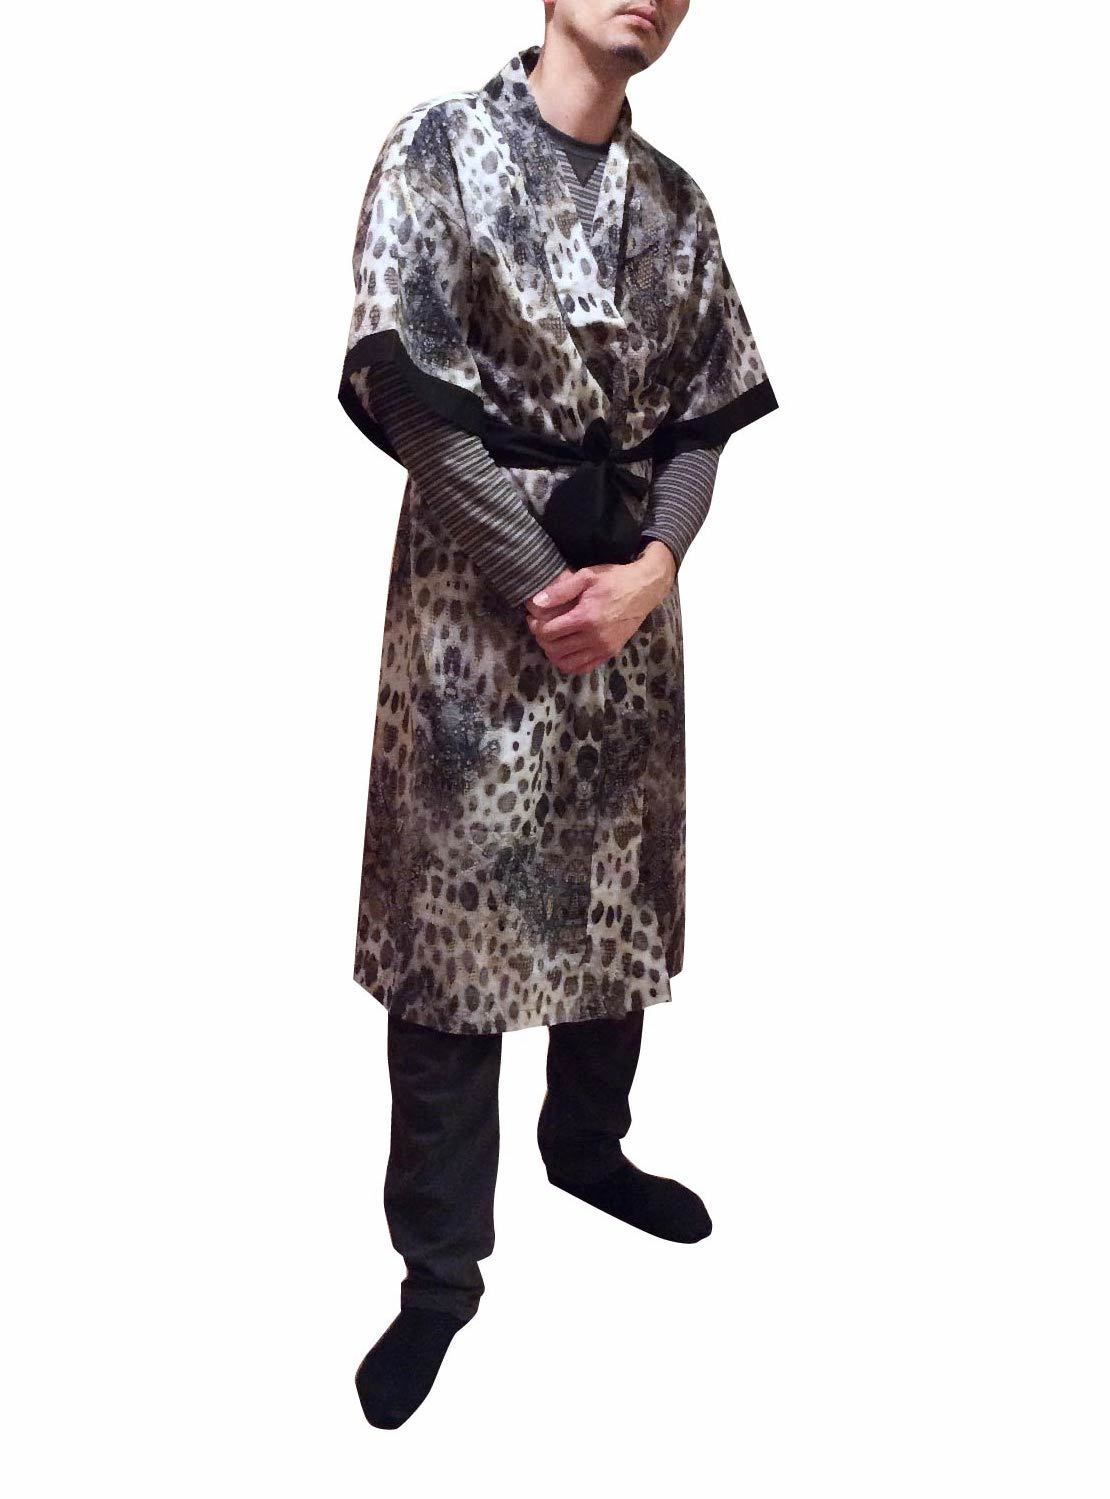 Long Robe Psychedelic Animal For Men ロングローブサイケデリックアニマルメンズ